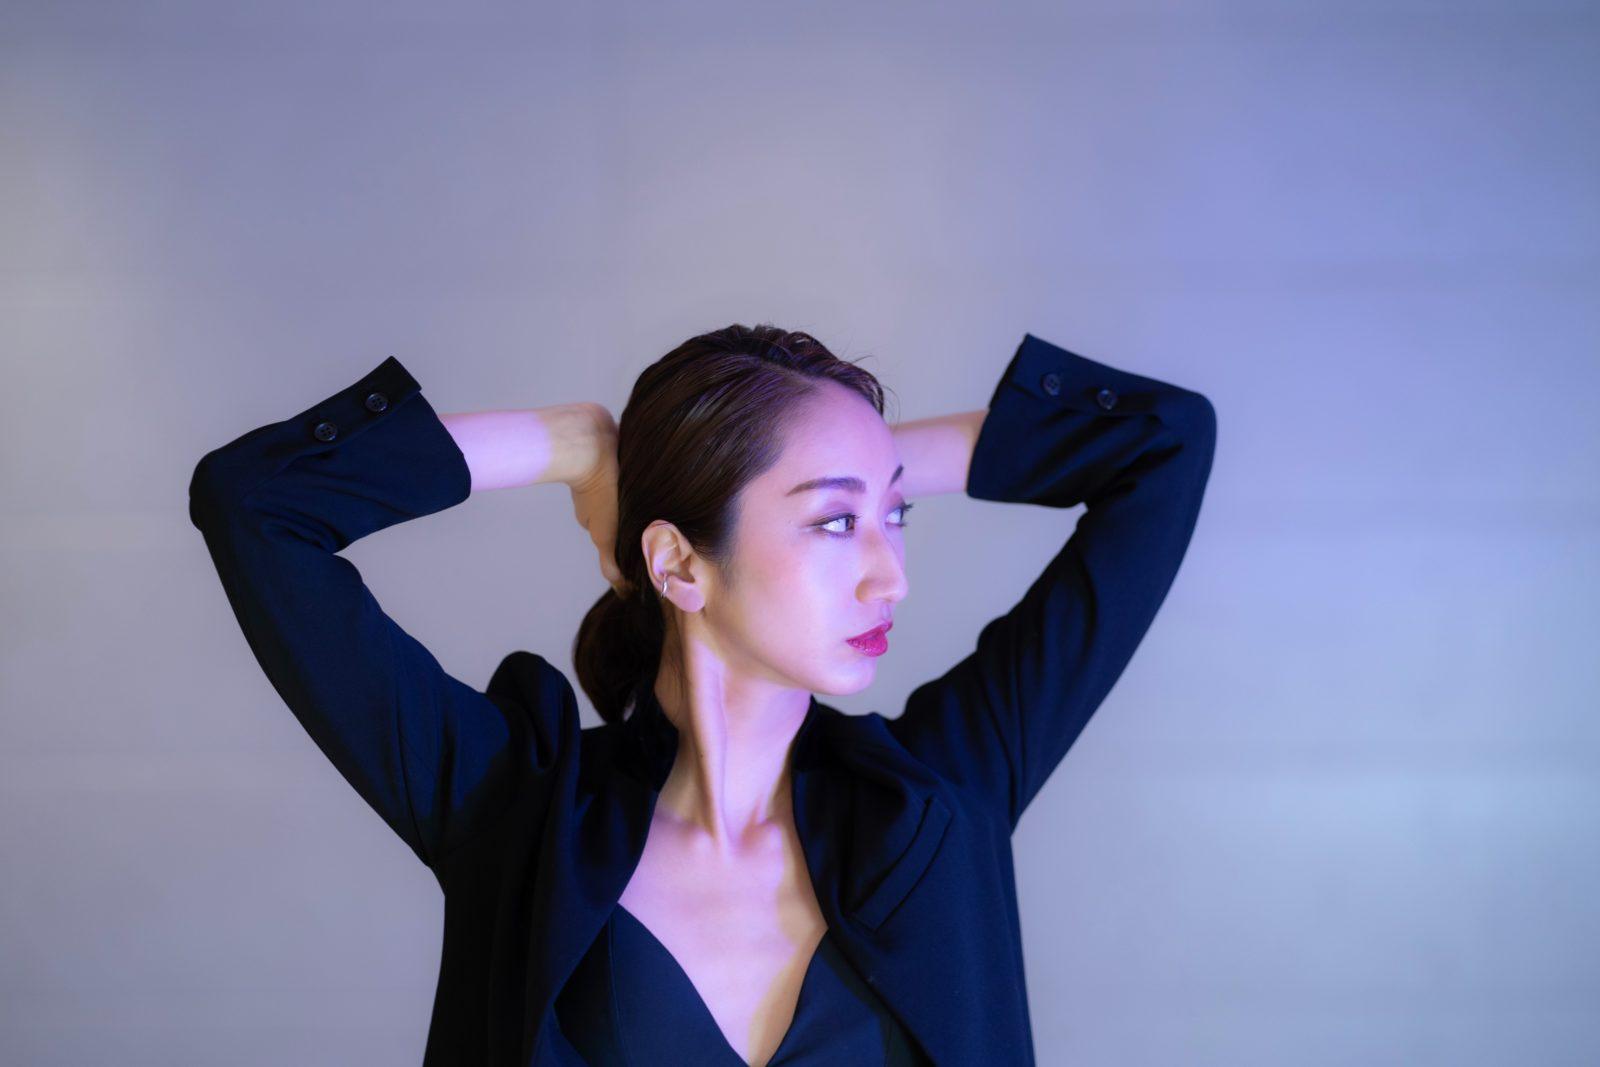 Ms.OOJA、3年ぶりのカバーアルバムの特設サイトがオープン&ジャケットイラストや全曲試聴可能なティザー映像も同時解禁サムネイル画像!